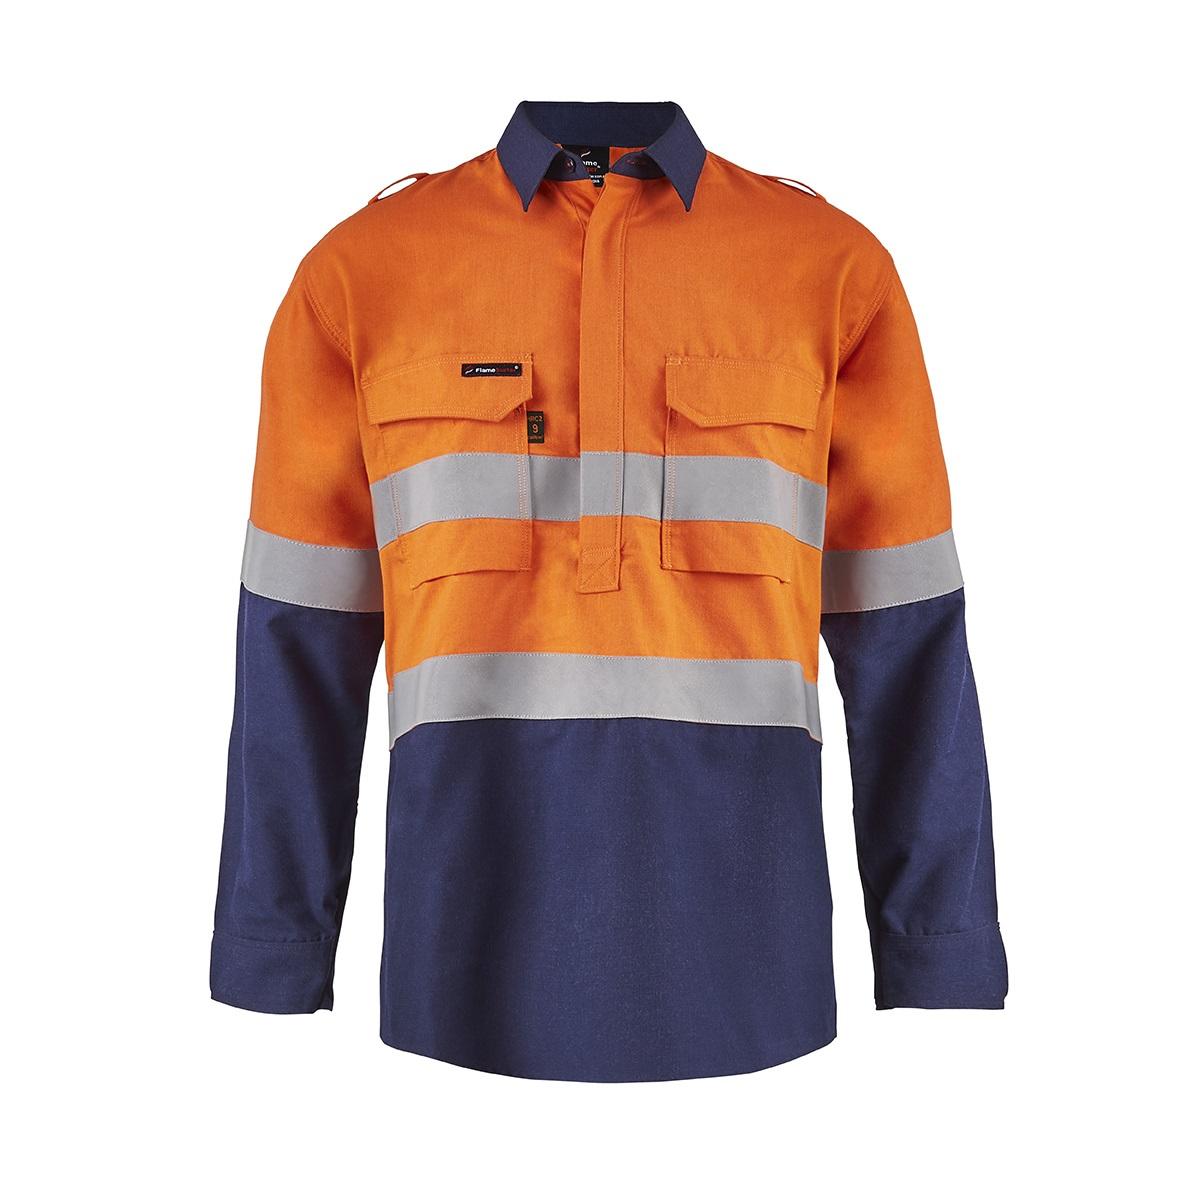 FSV015_torrent_mens_half_placket_shirt_orange-navy_front